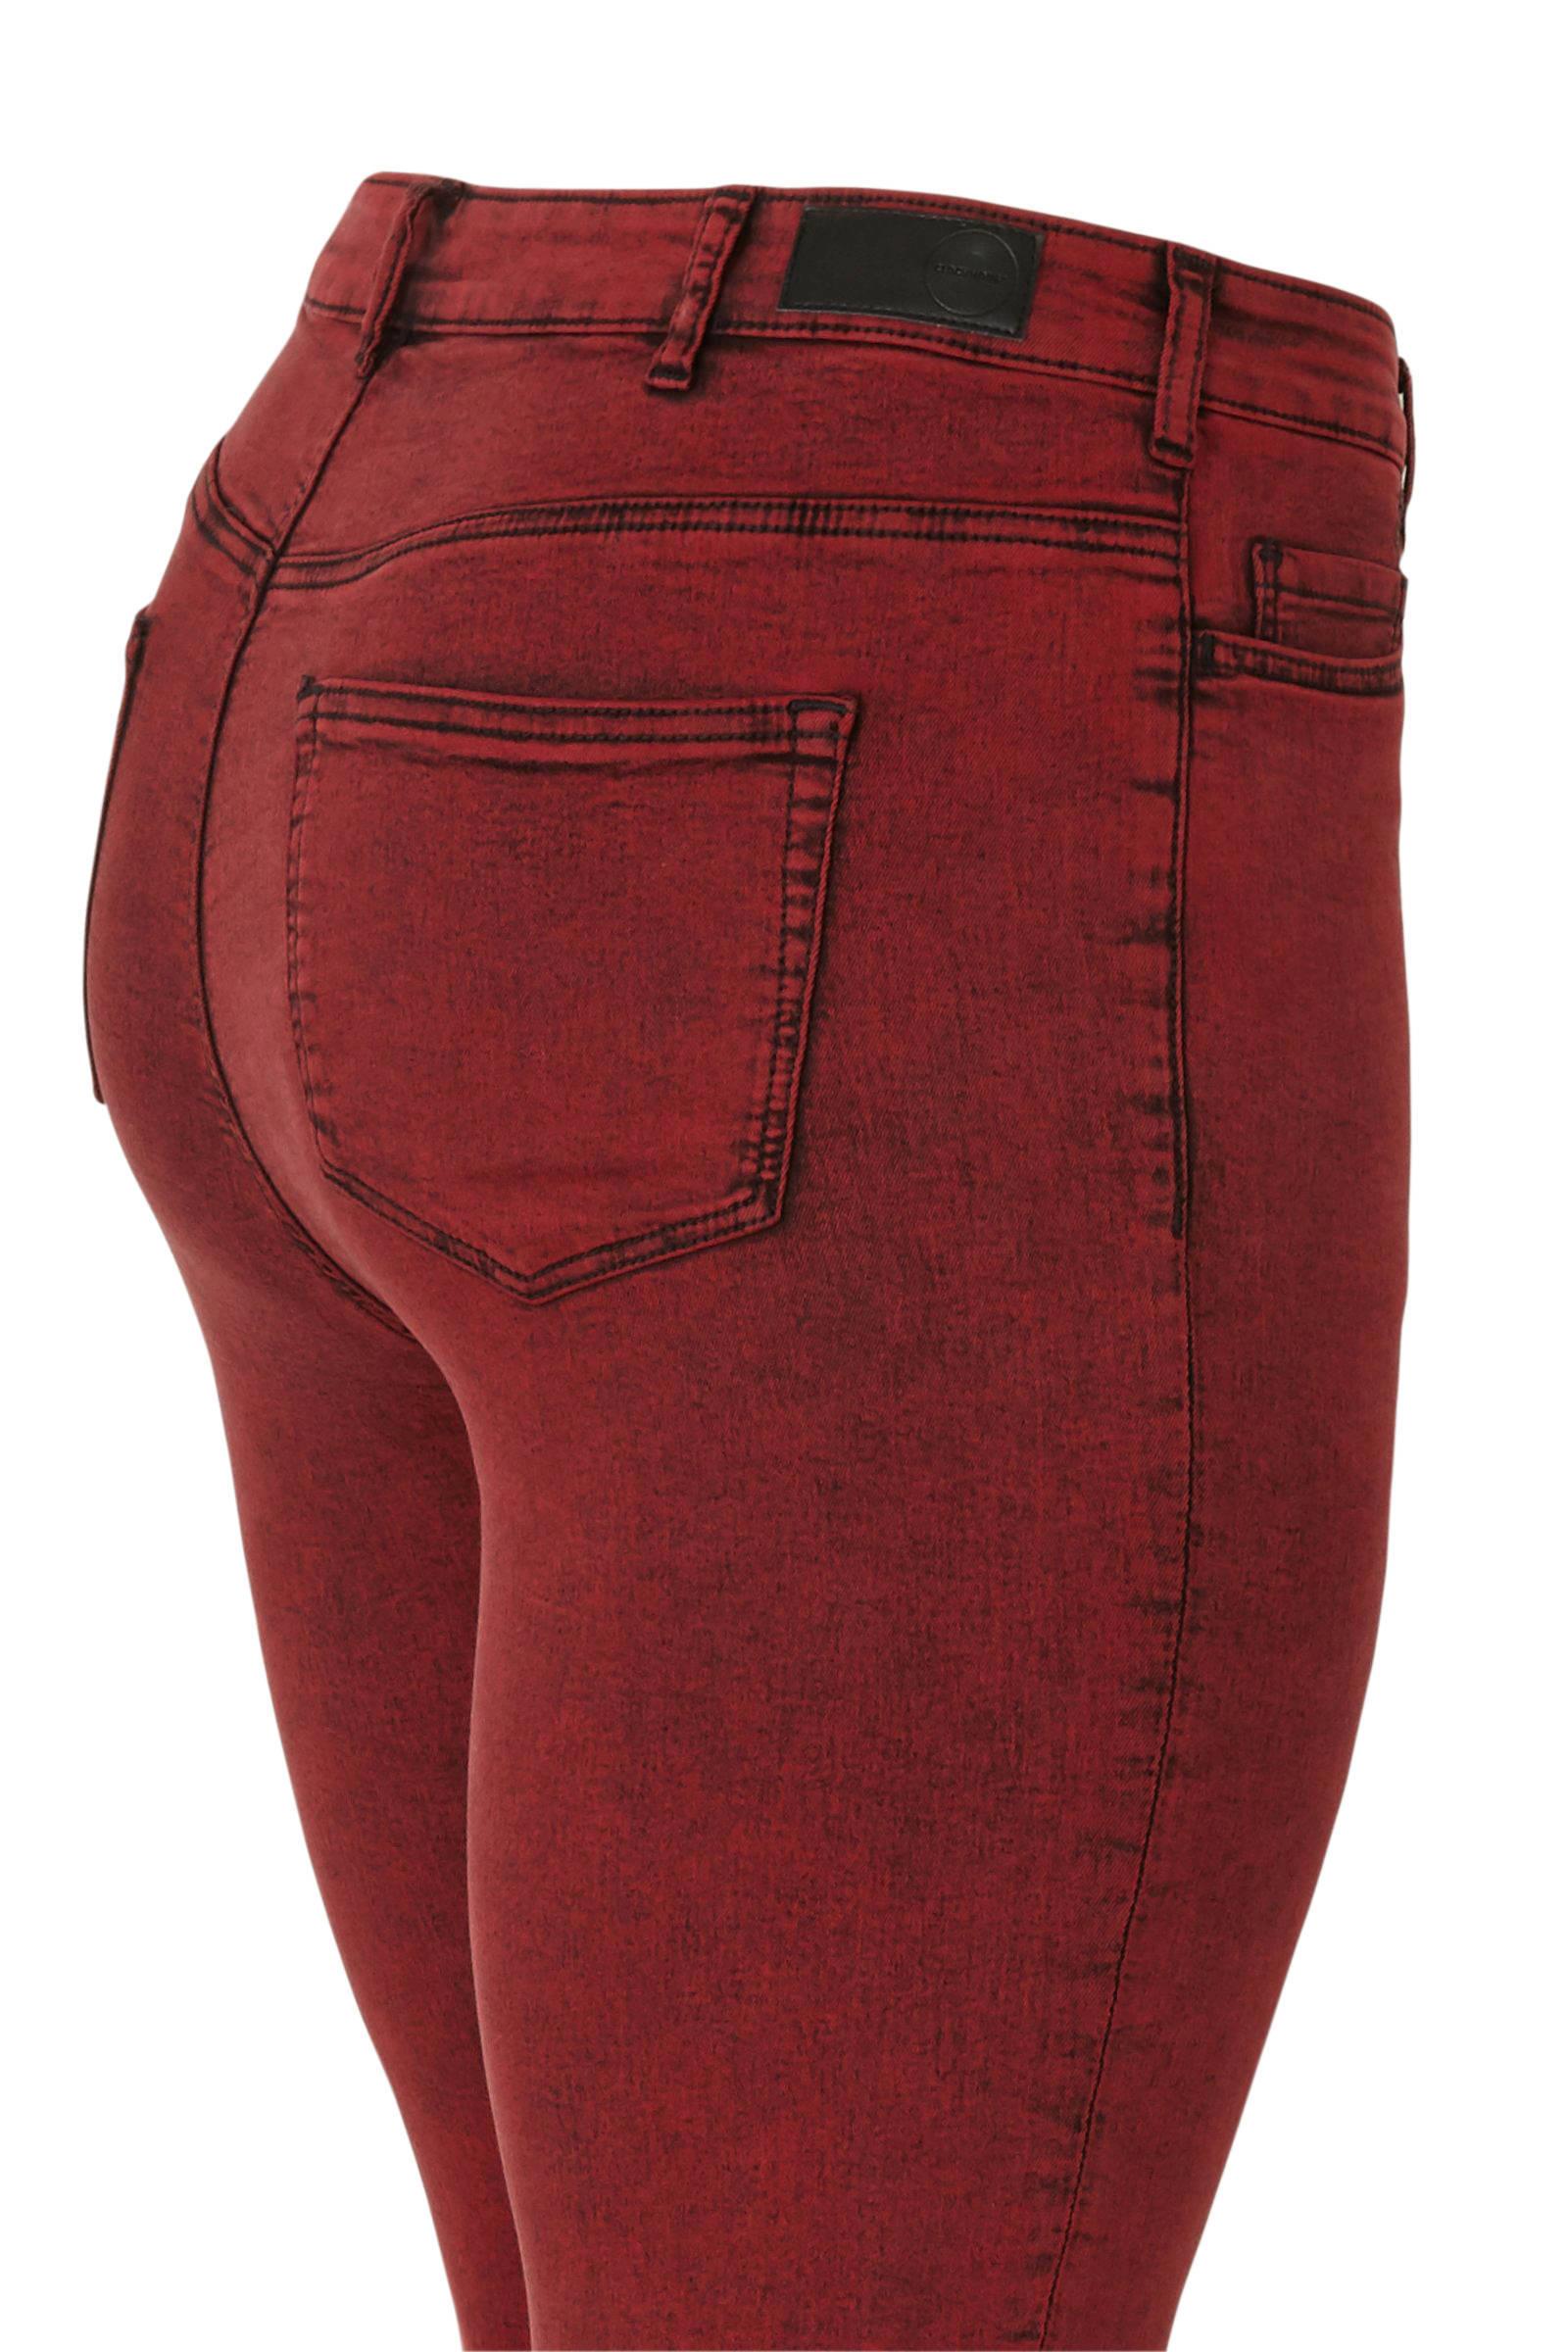 C&A XL Clockhouse high waist super skinny broek rood | wehkamp